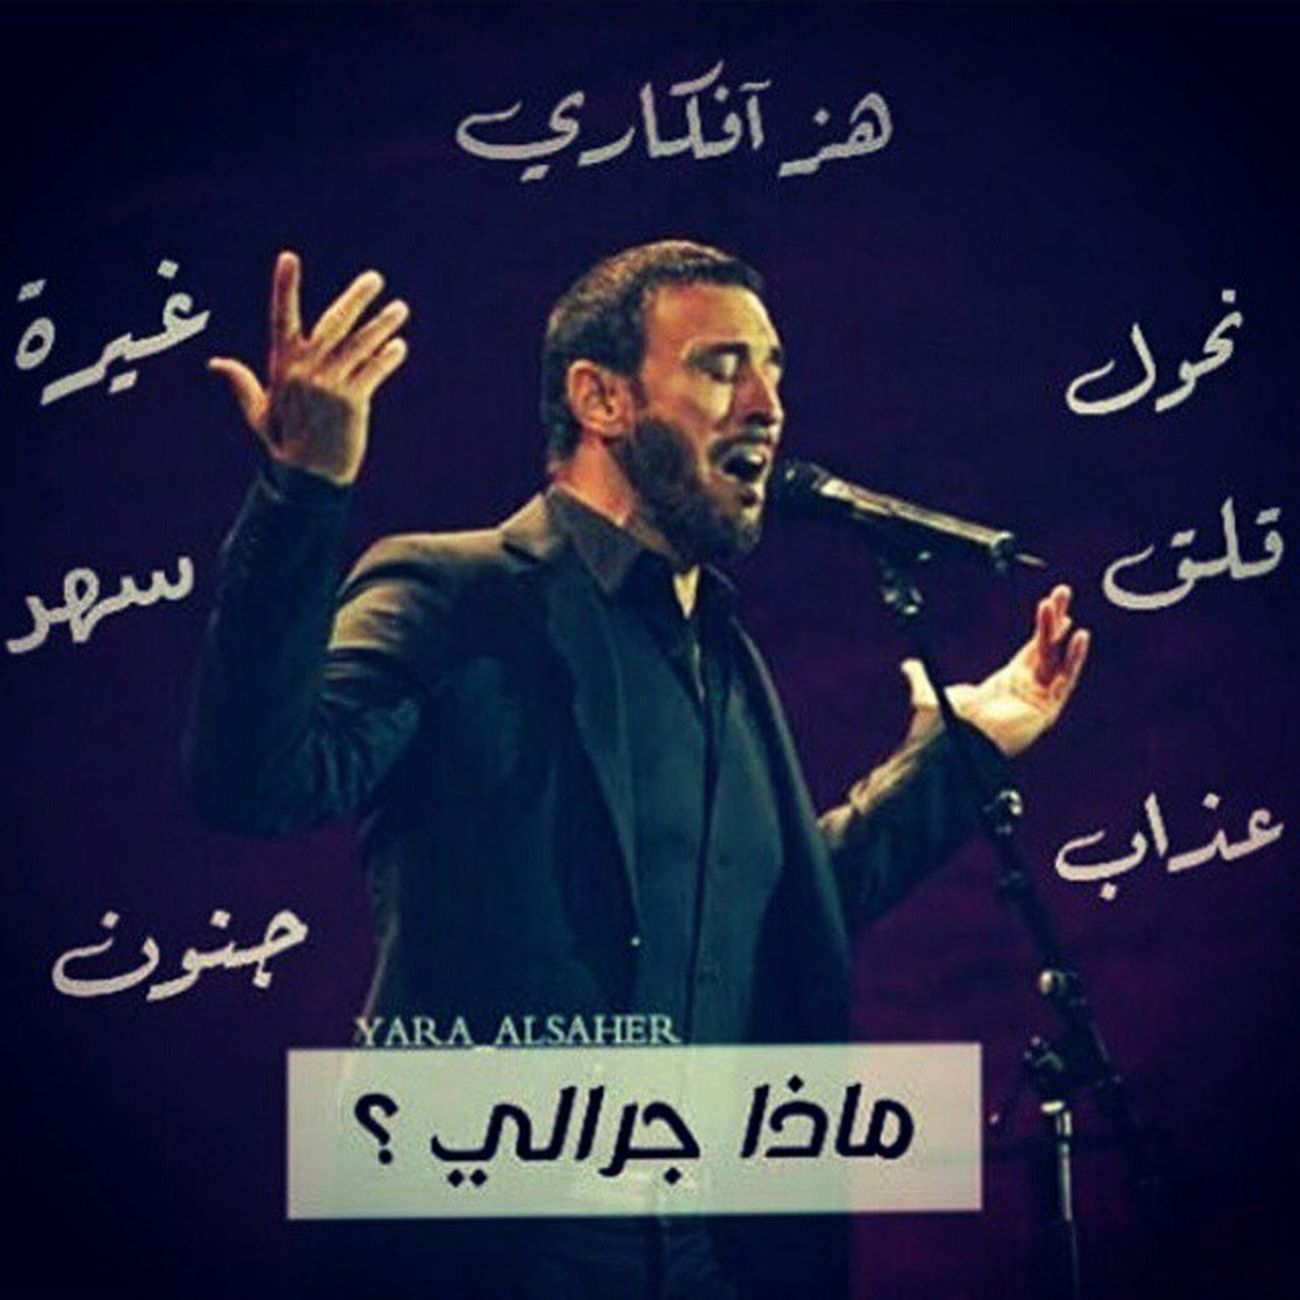 Caesar_kadim @caesar_kadim Caesar Kadim Music Love Romantic Tripoli Libya كاظم كاظم_ساهر اغاني حب غرام شوق اشتقتلك احبك طرابلس ليبيا